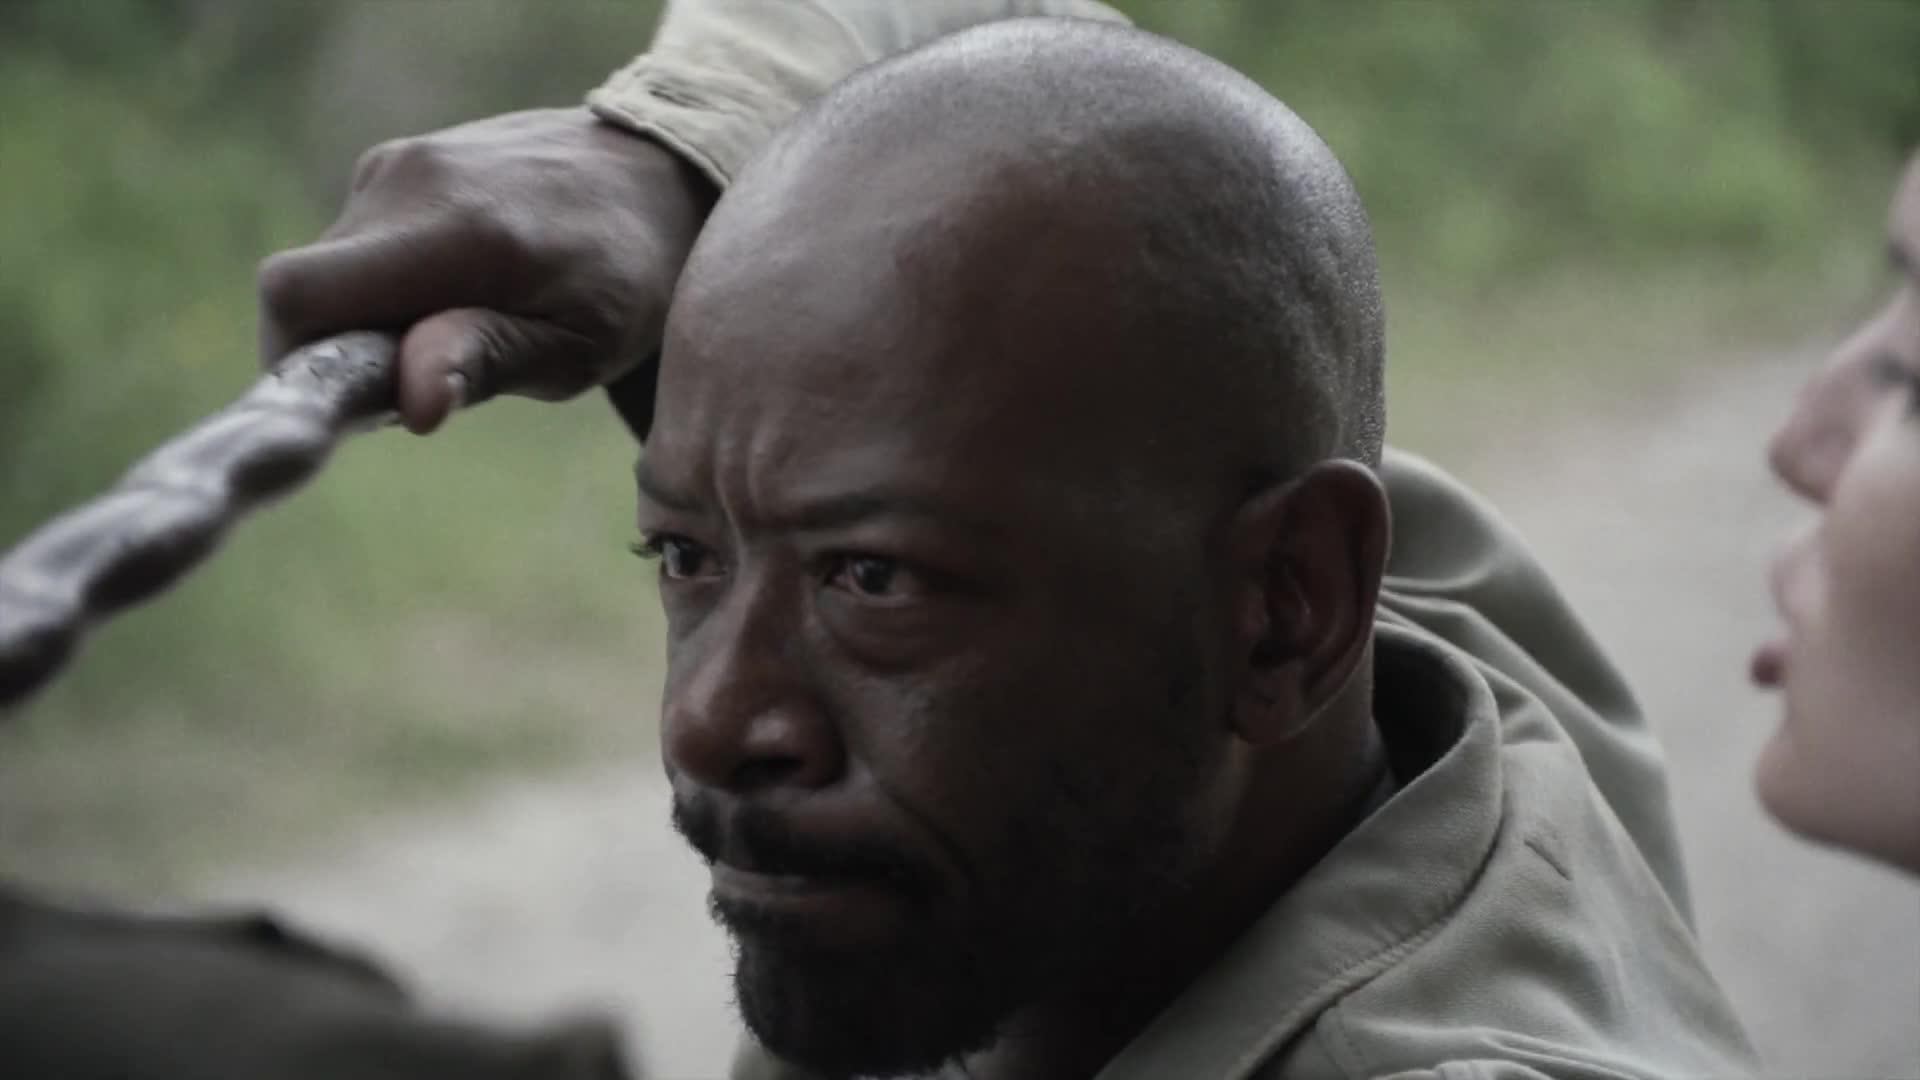 Trailer, Serie, Comic-Con, The Walking Dead, San Diego ComicCon, SDCC, Sdcc 2019, AMC, Fear the Walking Dead